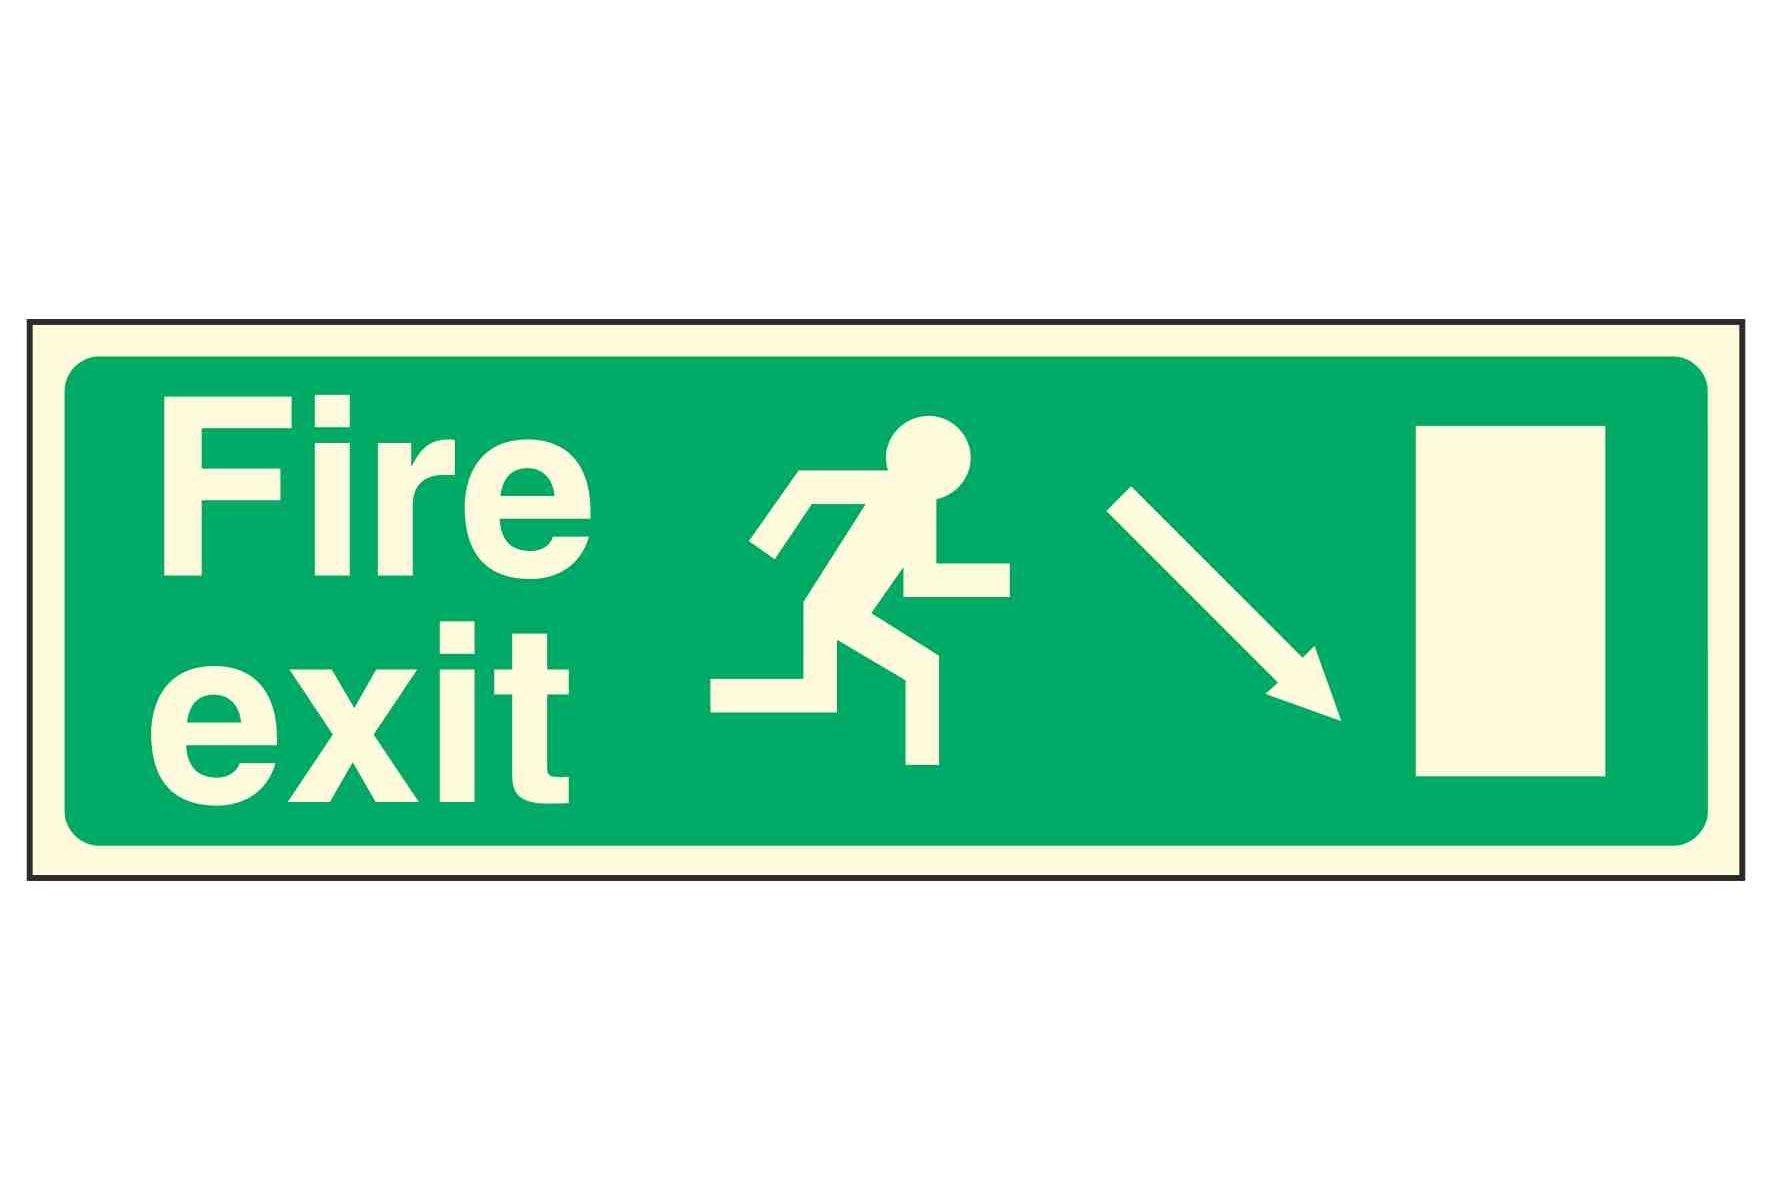 Fire exit / Running Man Right / Arrow Down Right - EEC 92/58 PL